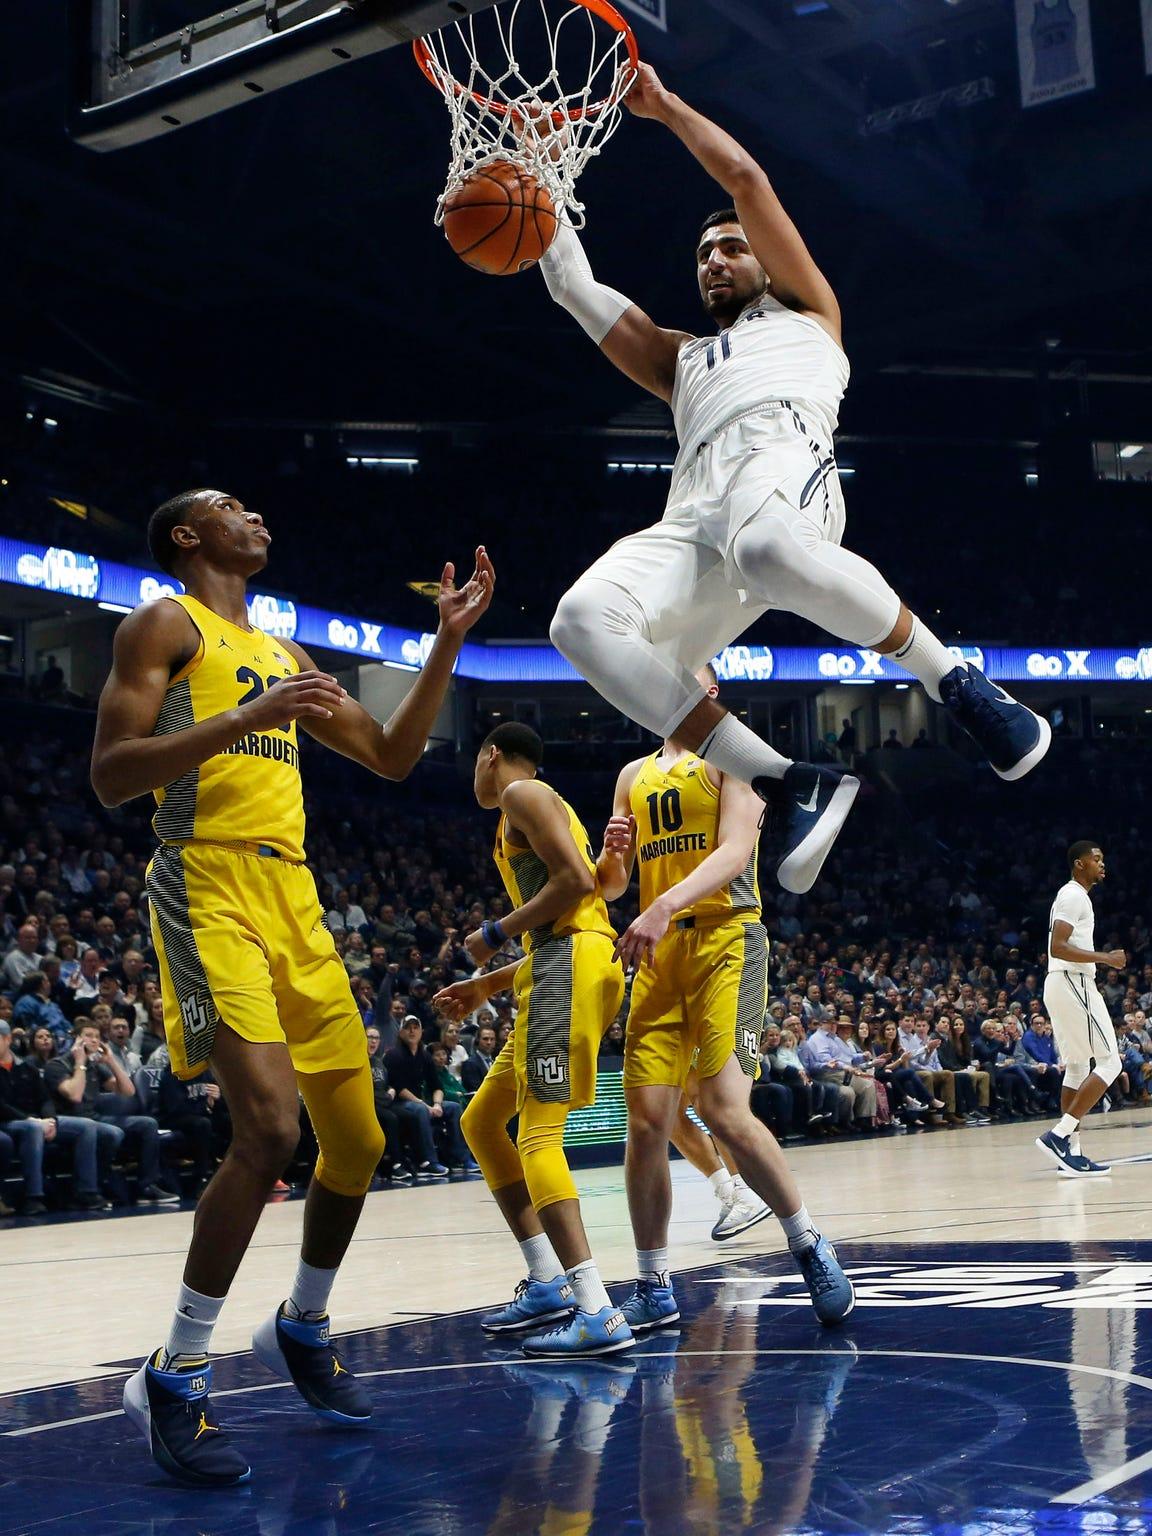 Xavier forward Kerem Kanter throws down a dunk against Marquette in the first half.